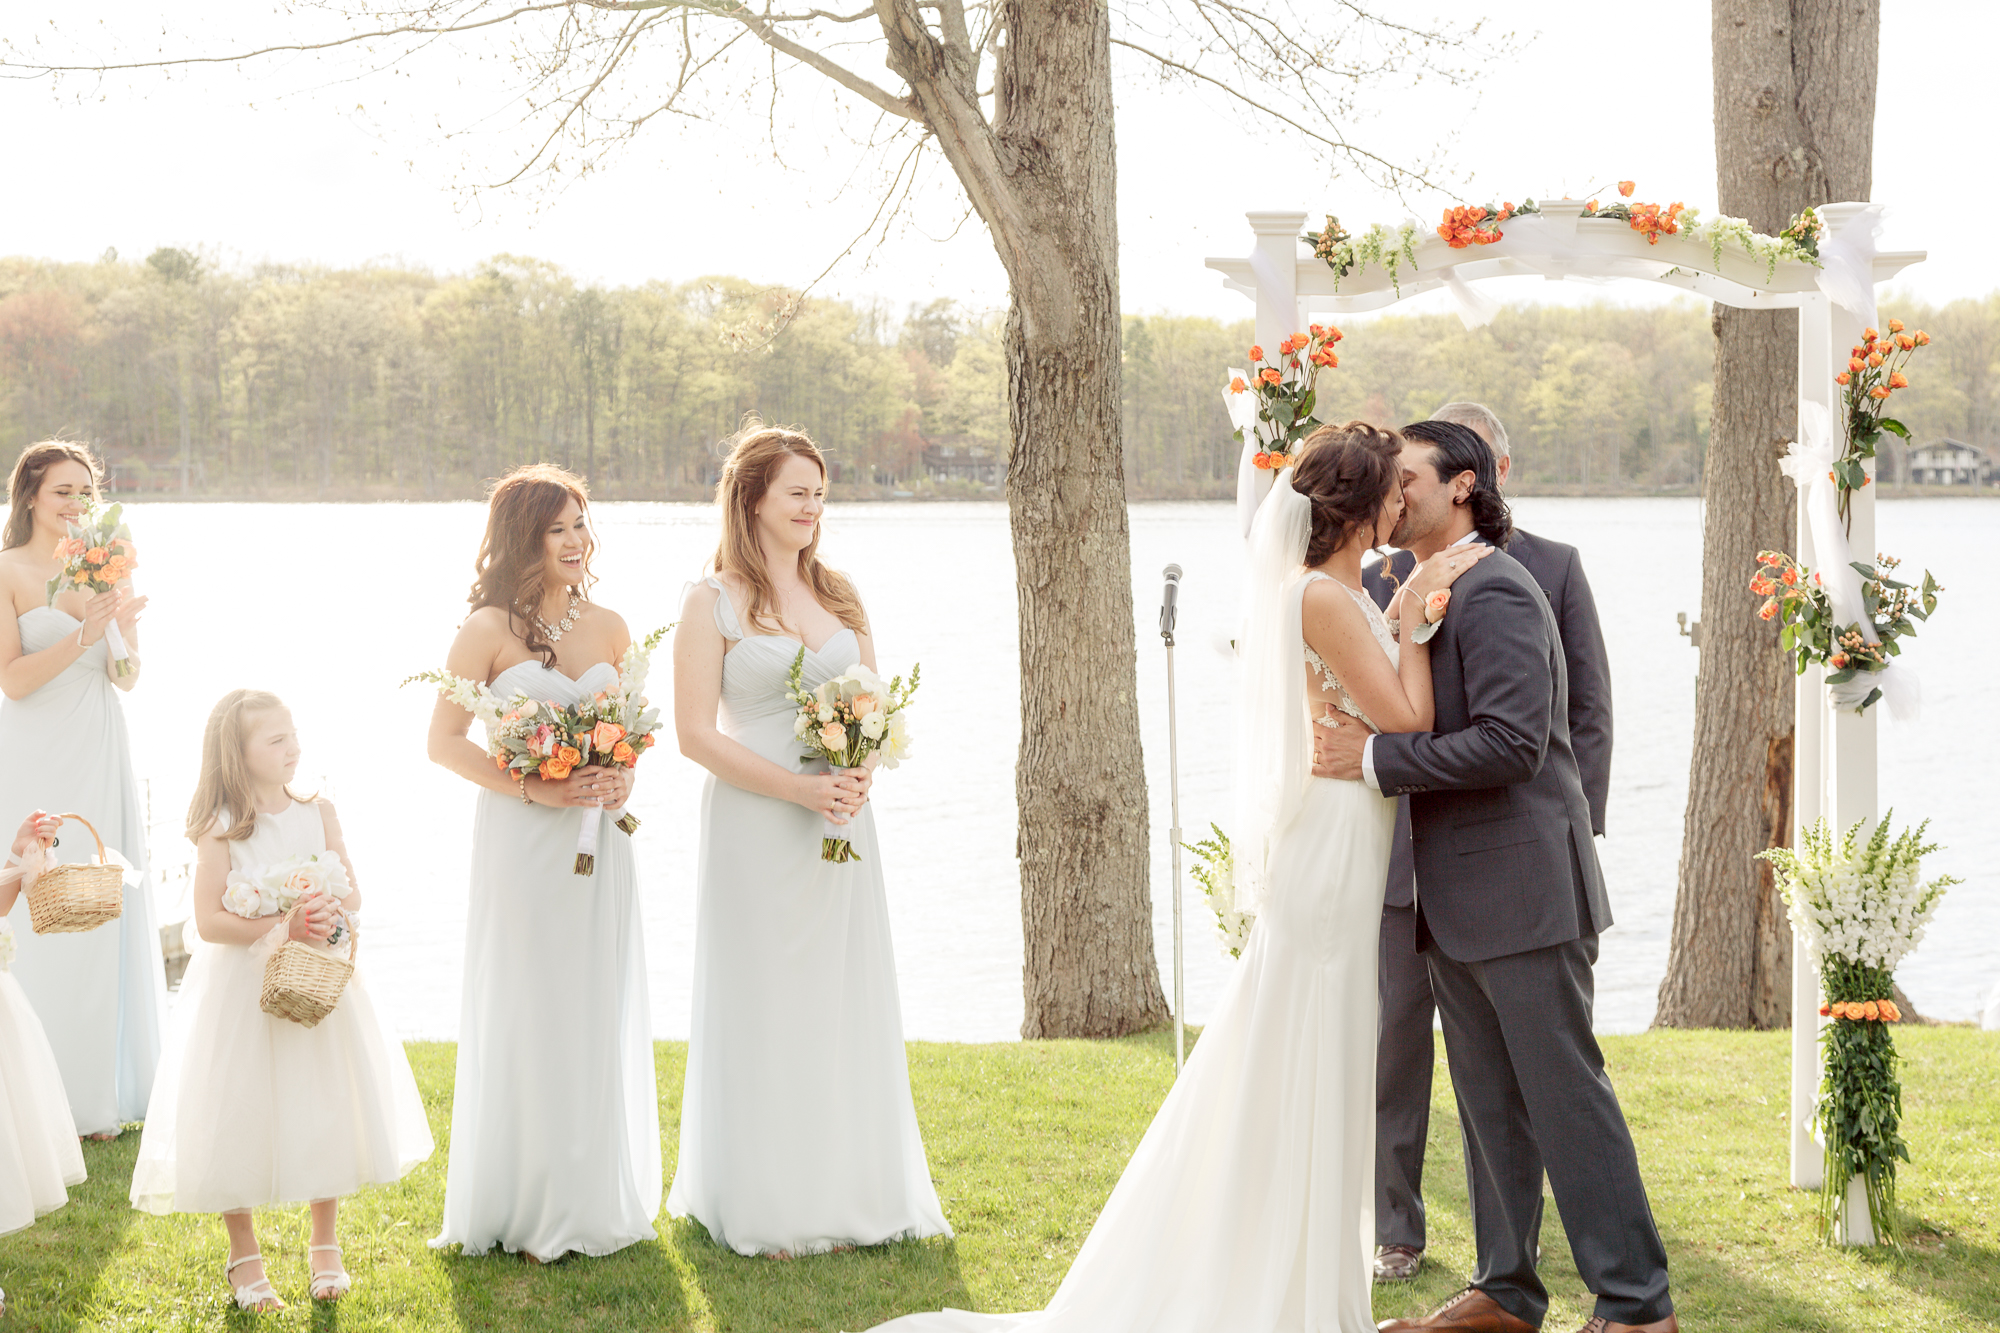 scranton-wedding-photography-zak-zavada-poconos--mattRachel-035.jpg